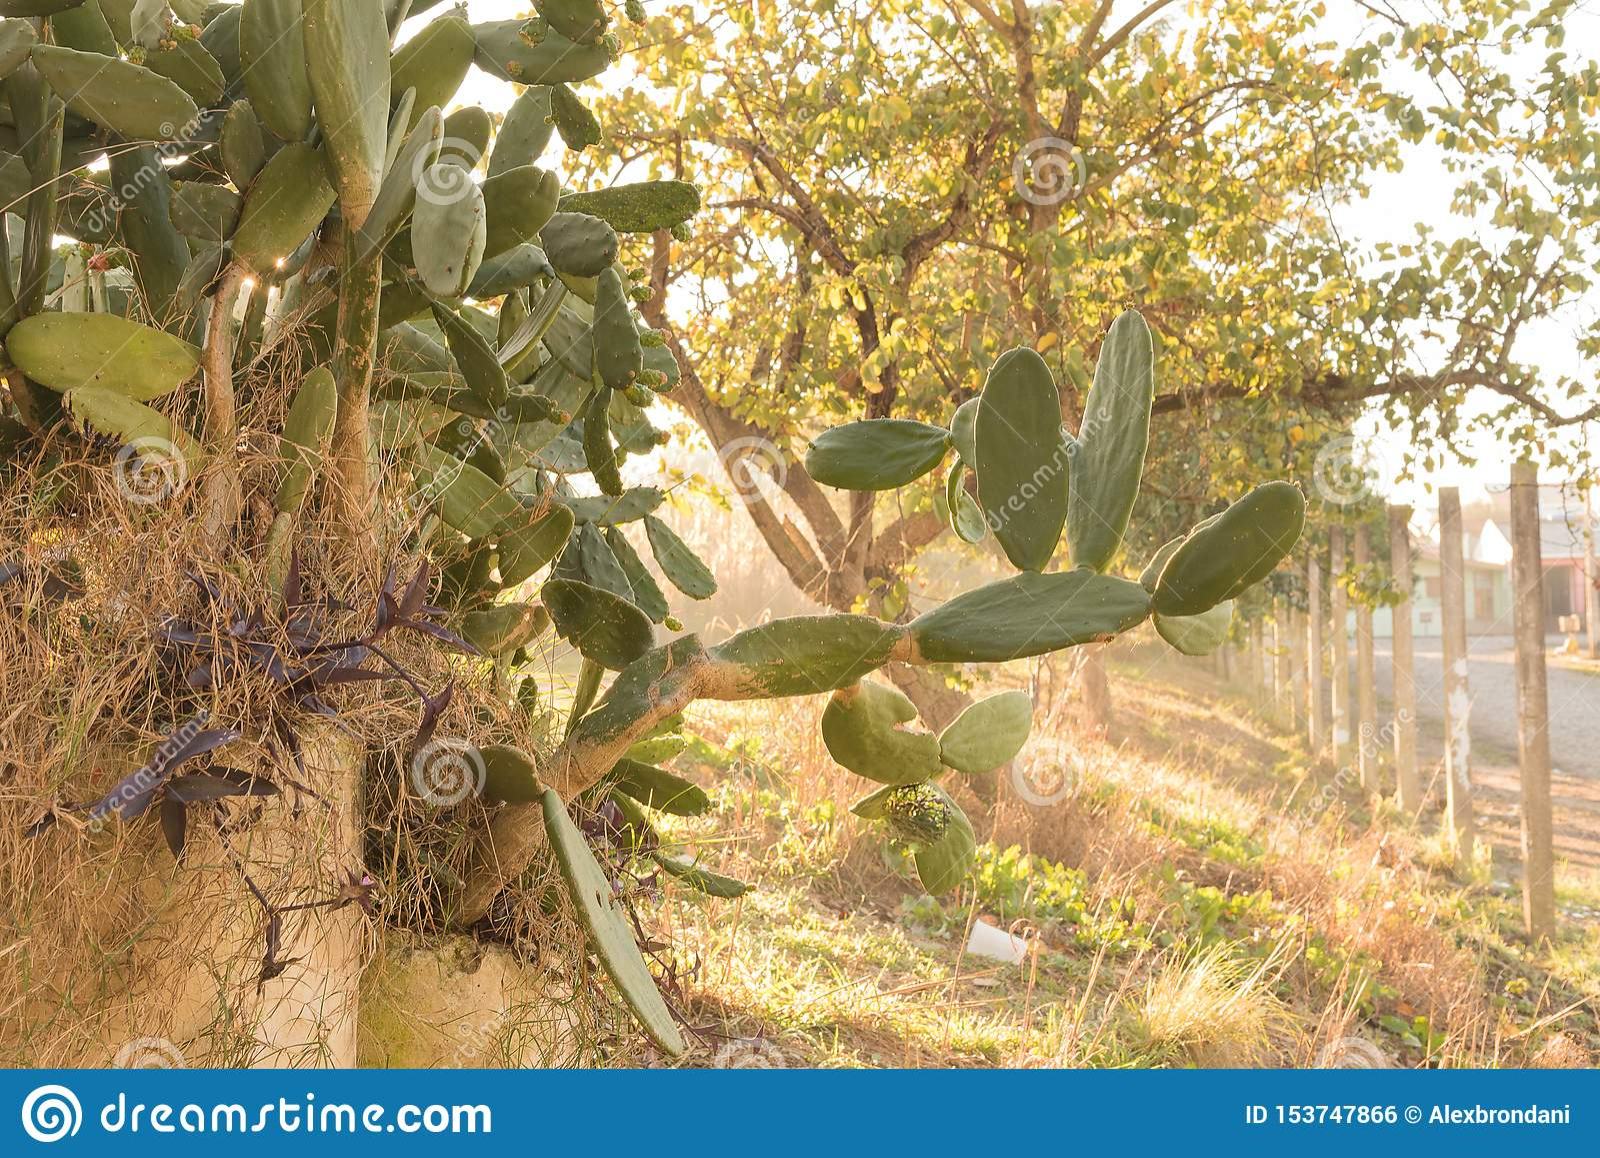 Flowering of Cactus Opuntia in winter morning 06